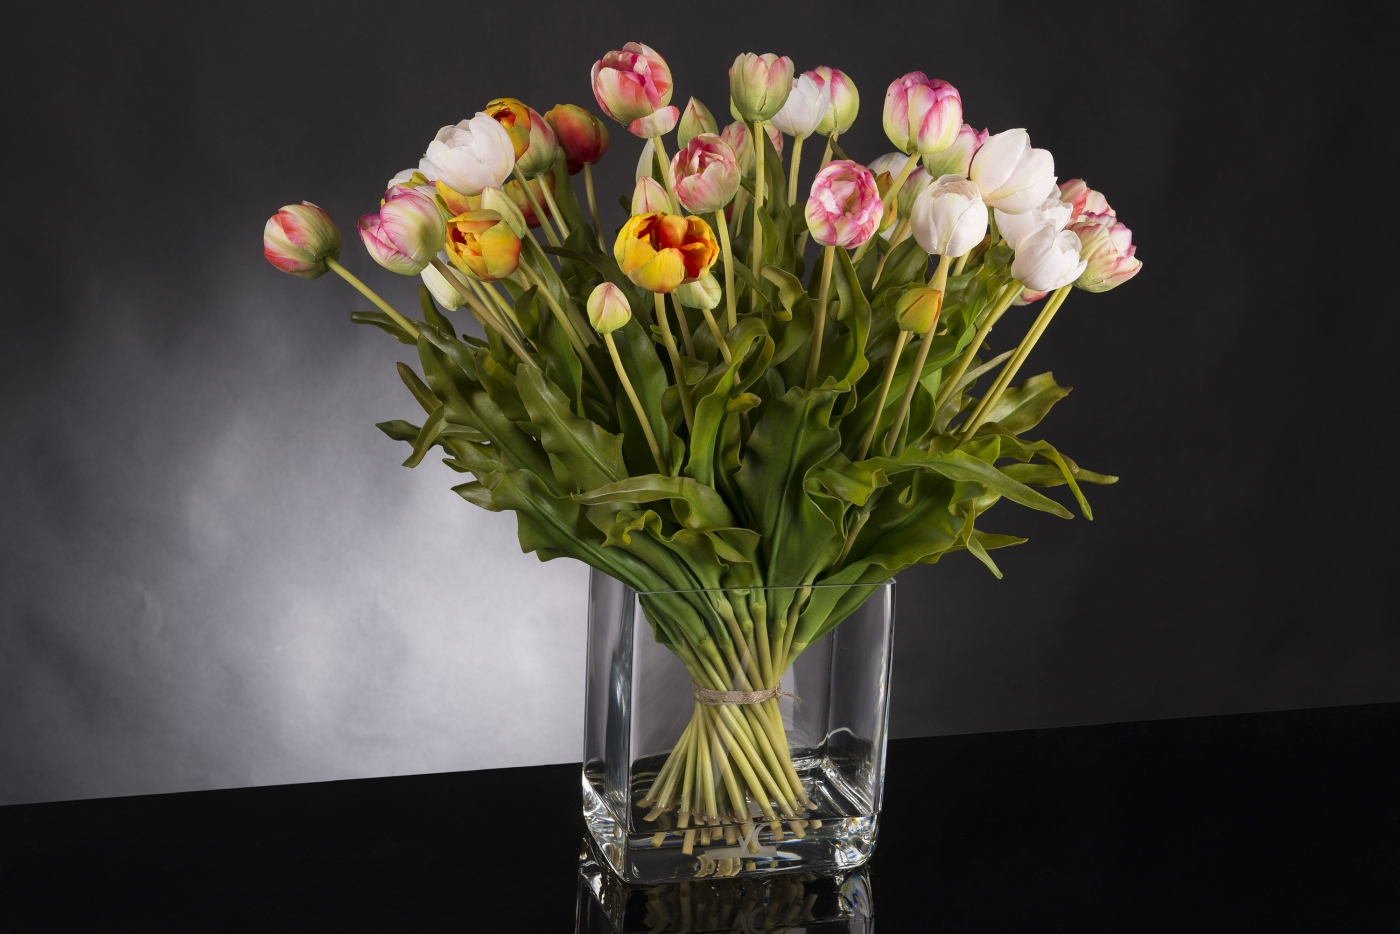 Floral arrangments - Tulips Mix by VG New Trend - Masha Shapiro Agency.jpg